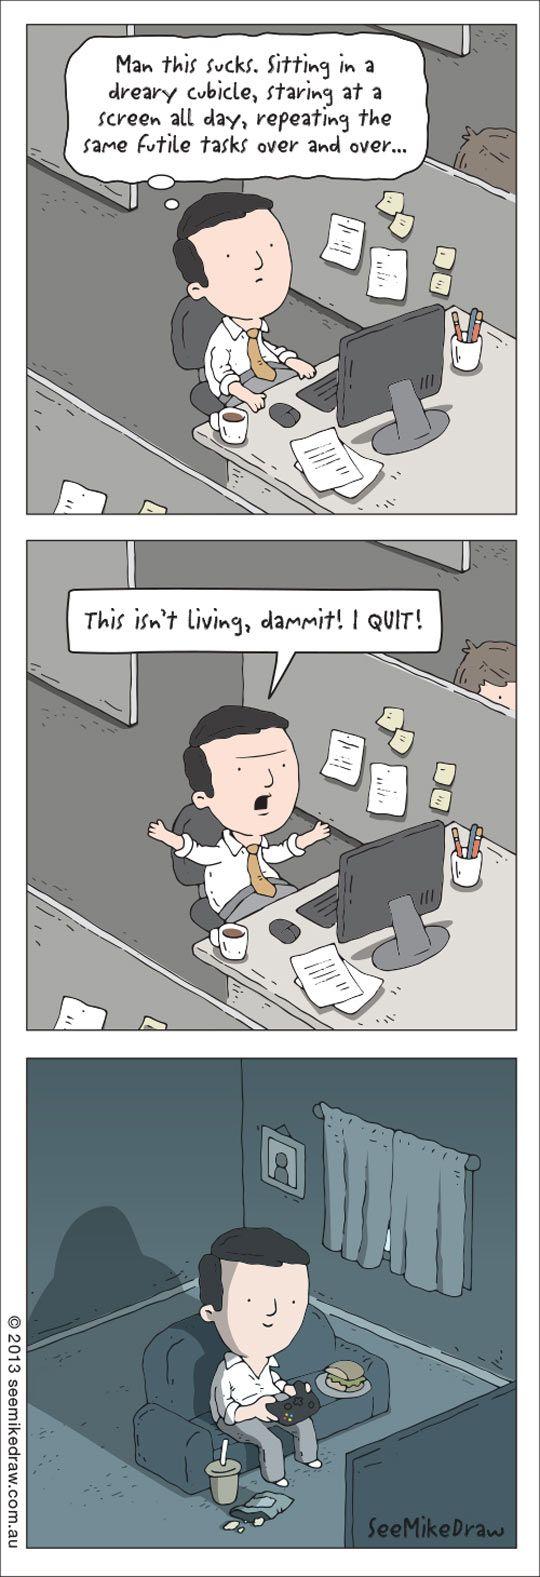 Quit Job Funny Funny i Quit This Job